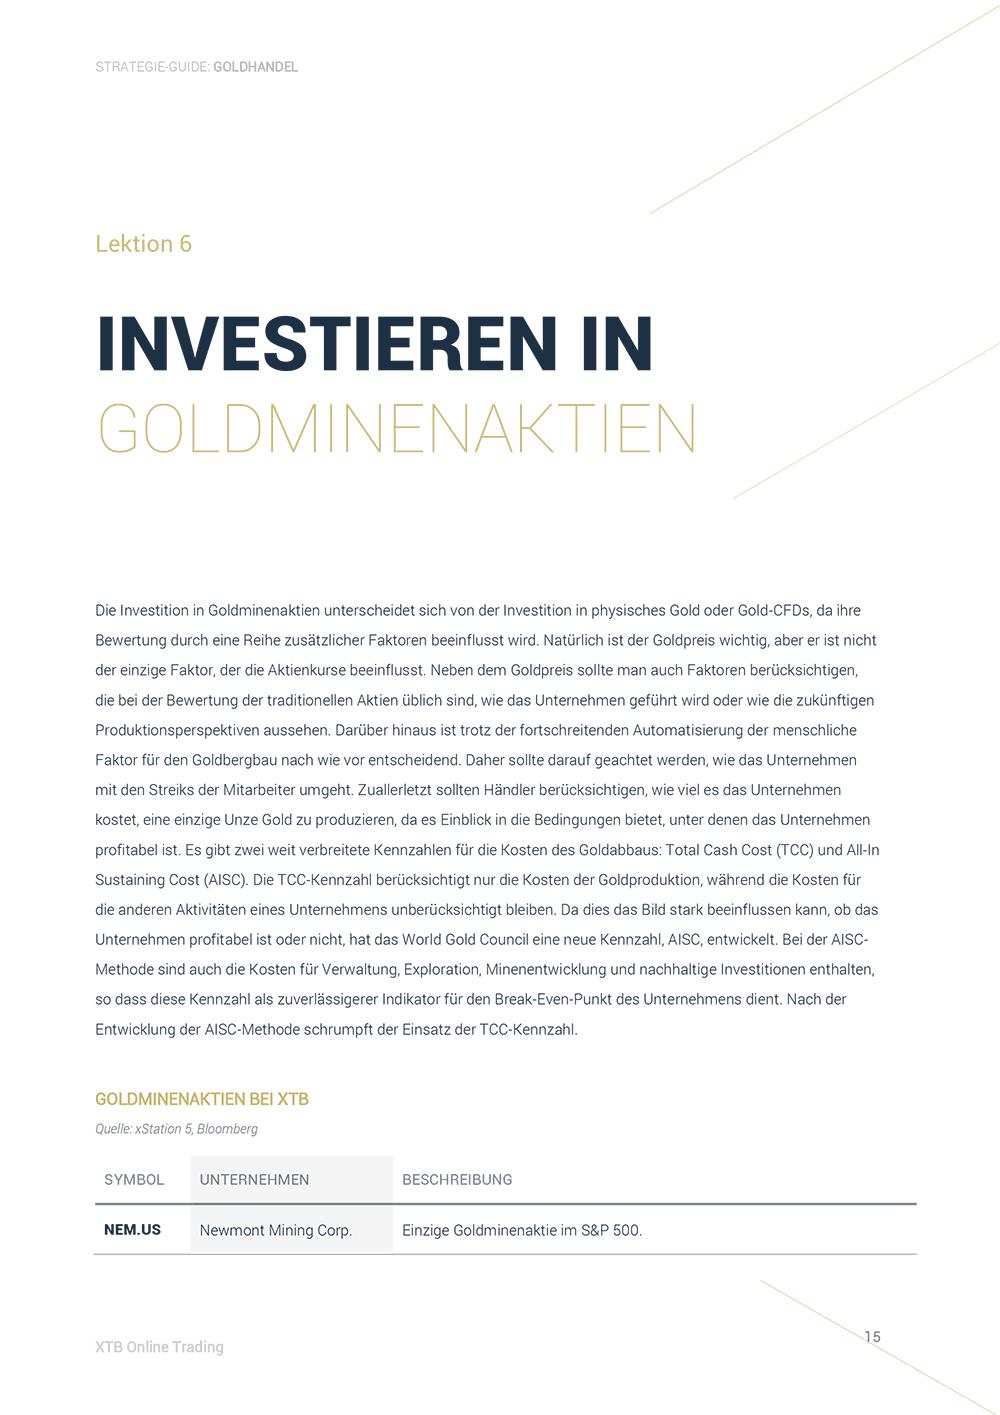 DE_Gold Strategy-Guide_ESMA79-15 (1)